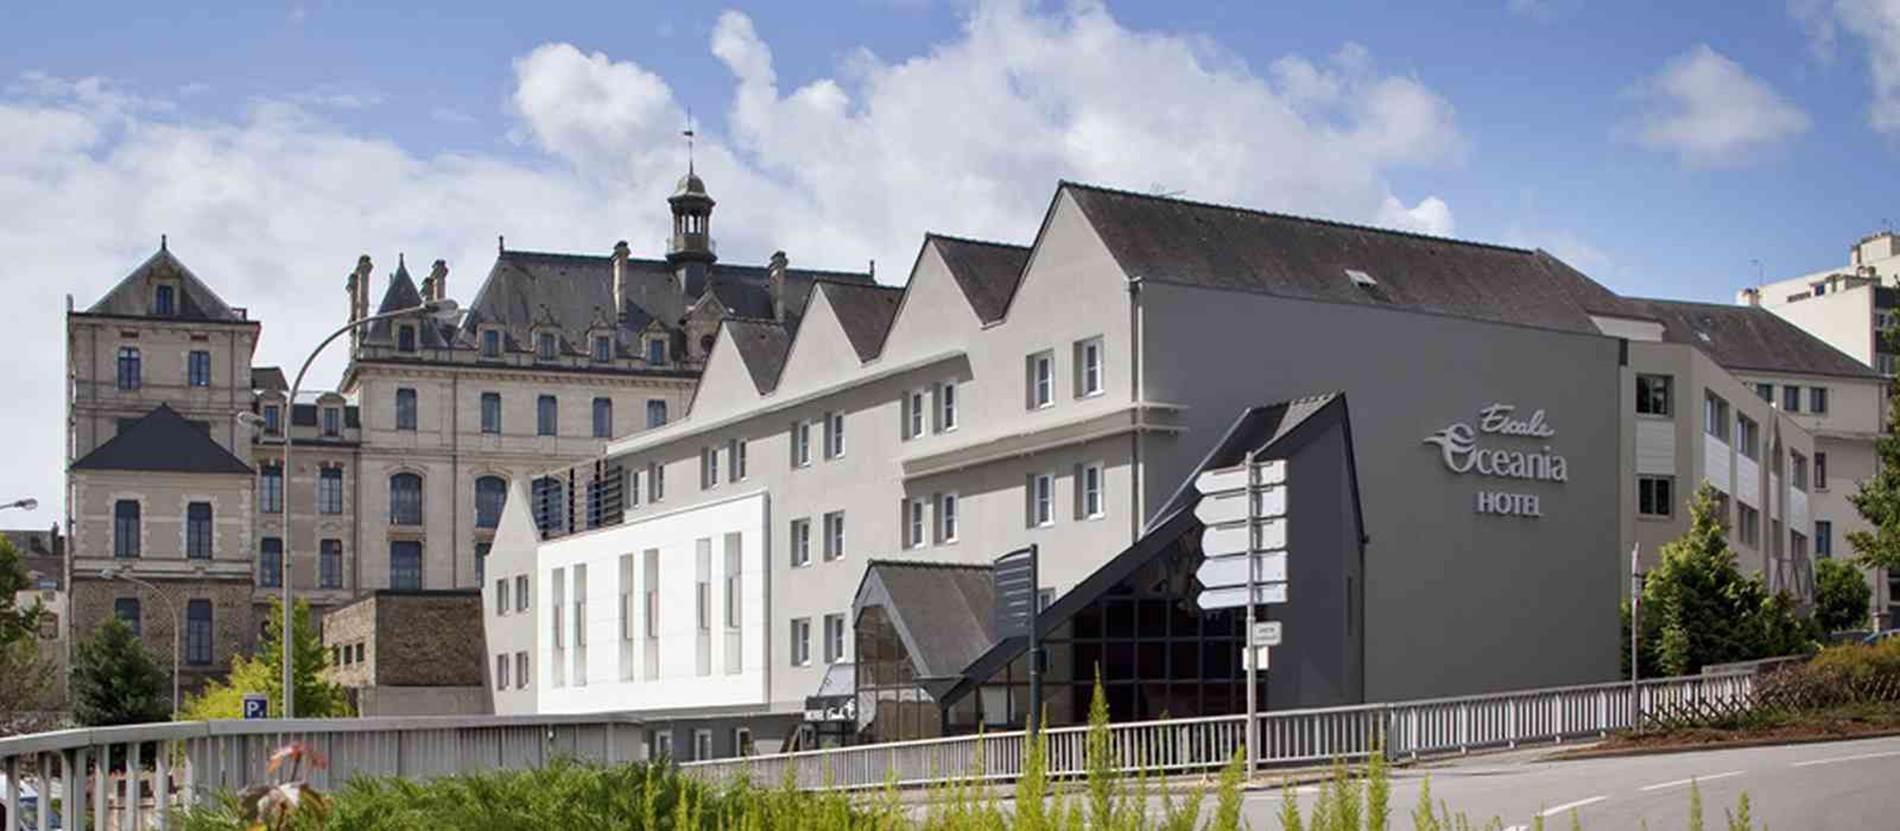 Hôtel-Escale-Océania-Vannes-Morbihan-Bretagne-Sud © Hôtel-Escale-Océania-Vannes